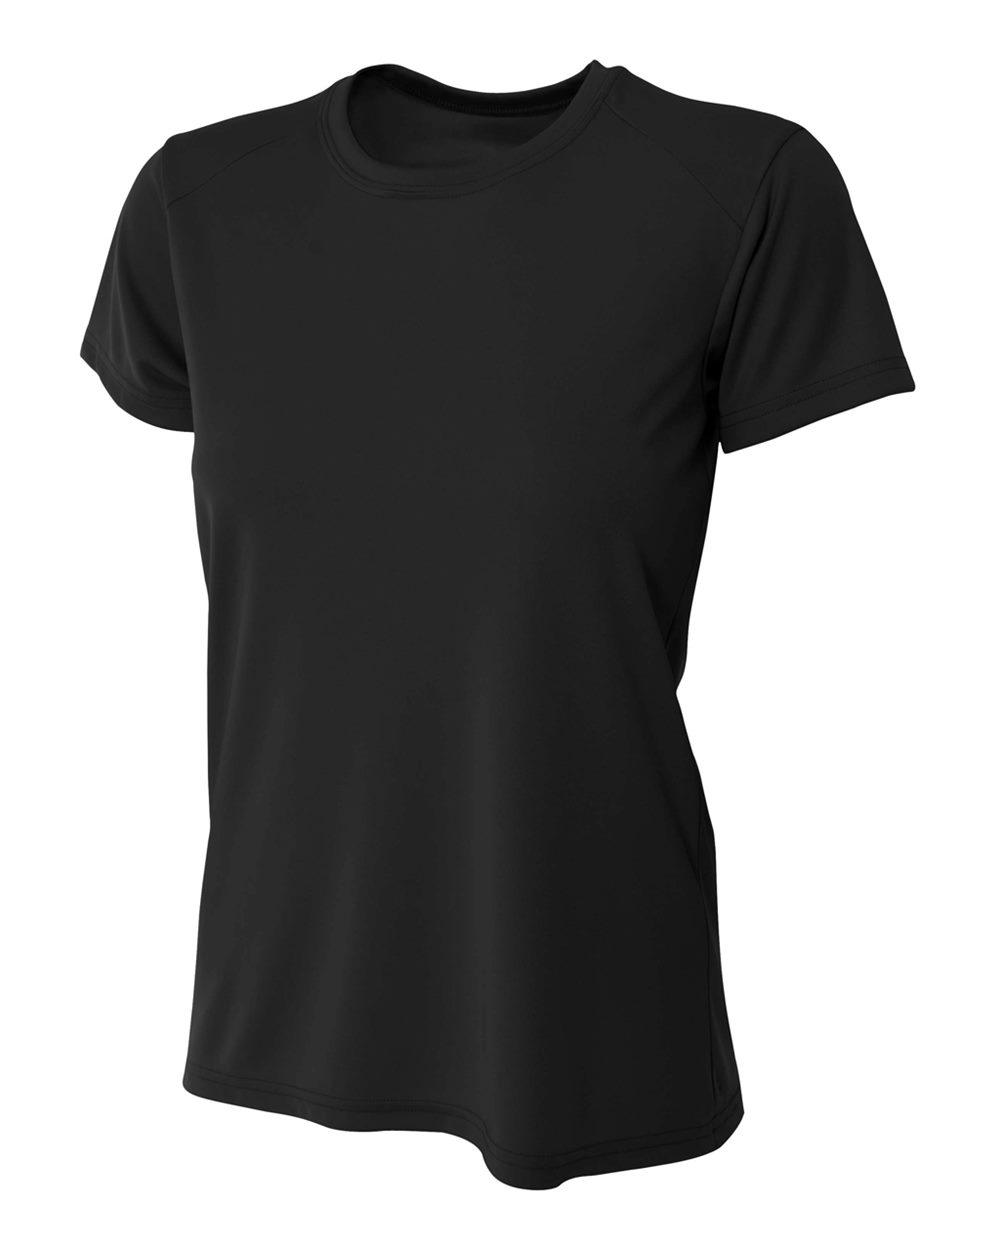 womens-polo-mwicking-black.jpg